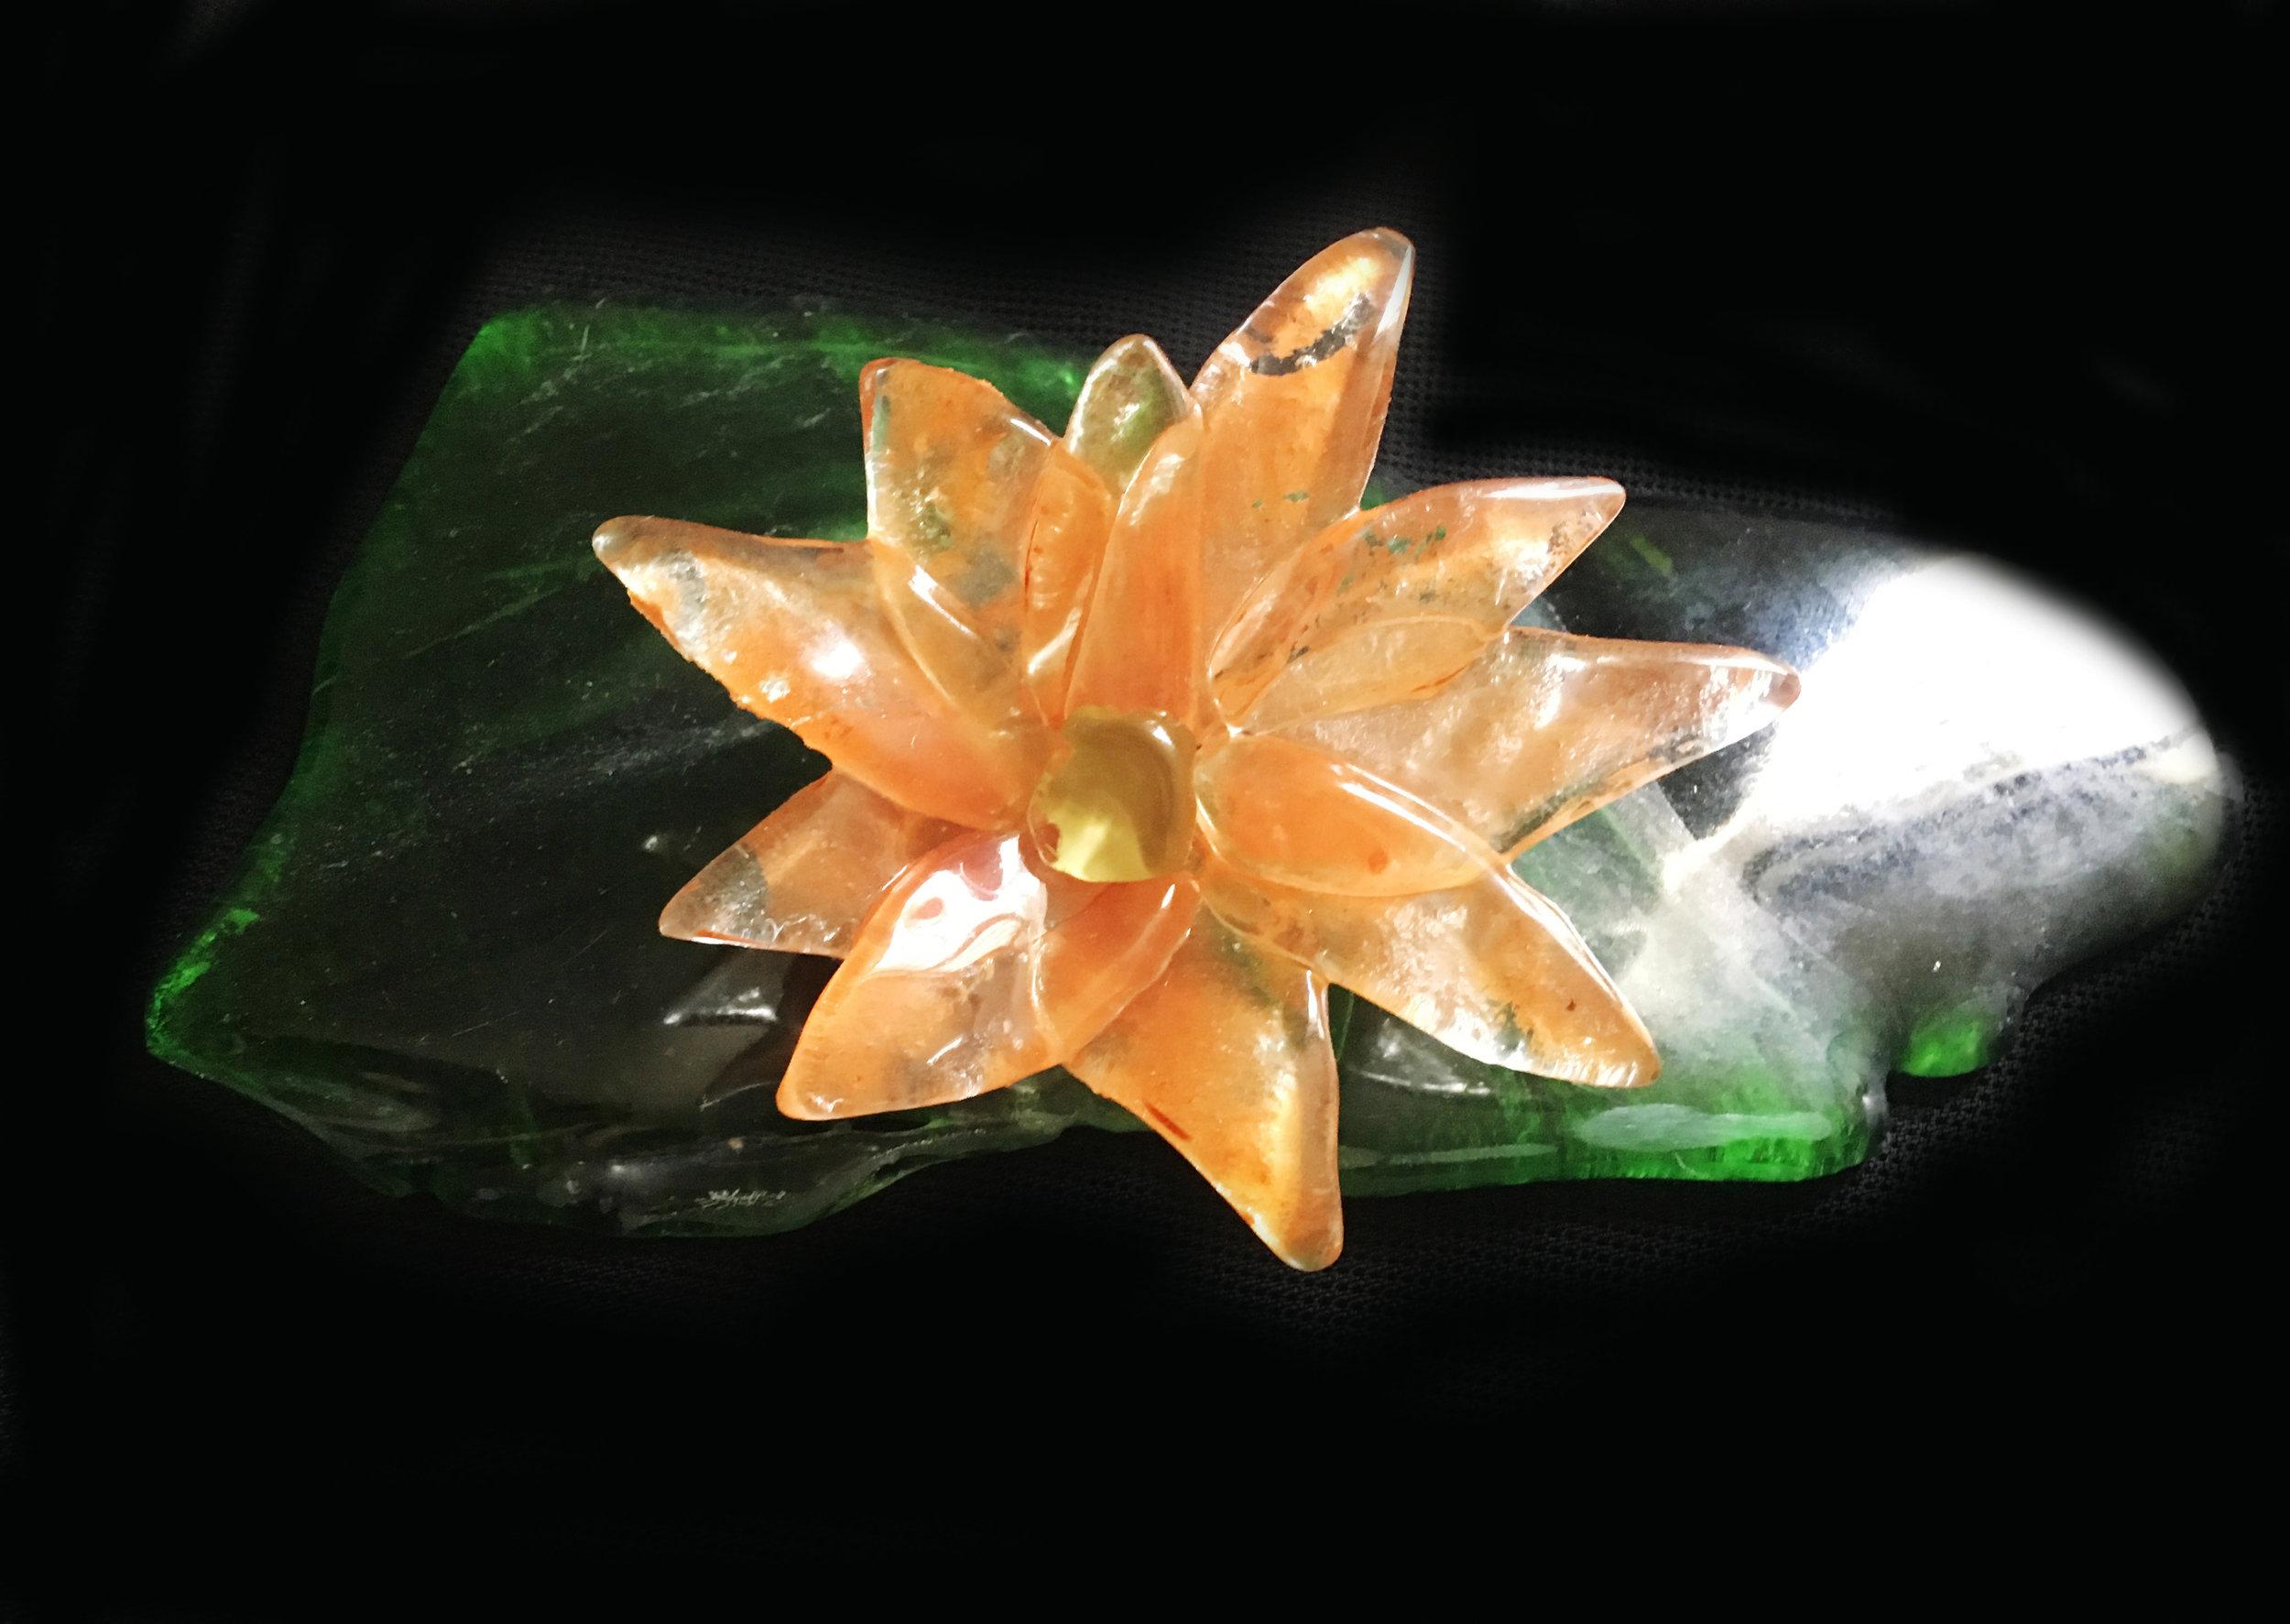 flor laranja e verde R$60,00